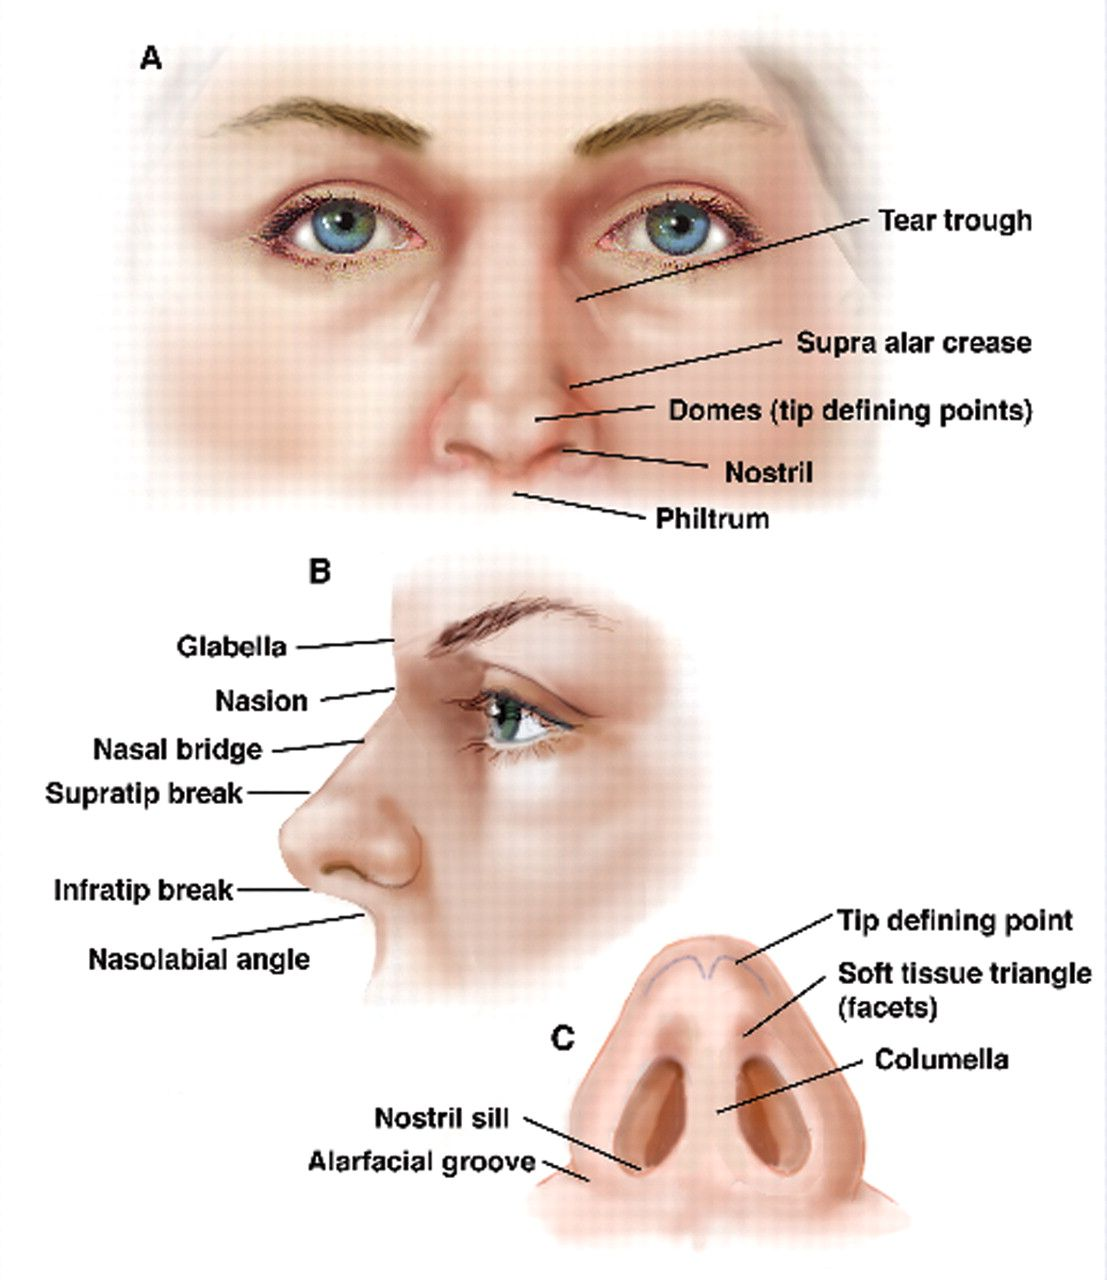 nose anatomy - Google Search   my project   Pinterest   Anatomy ...